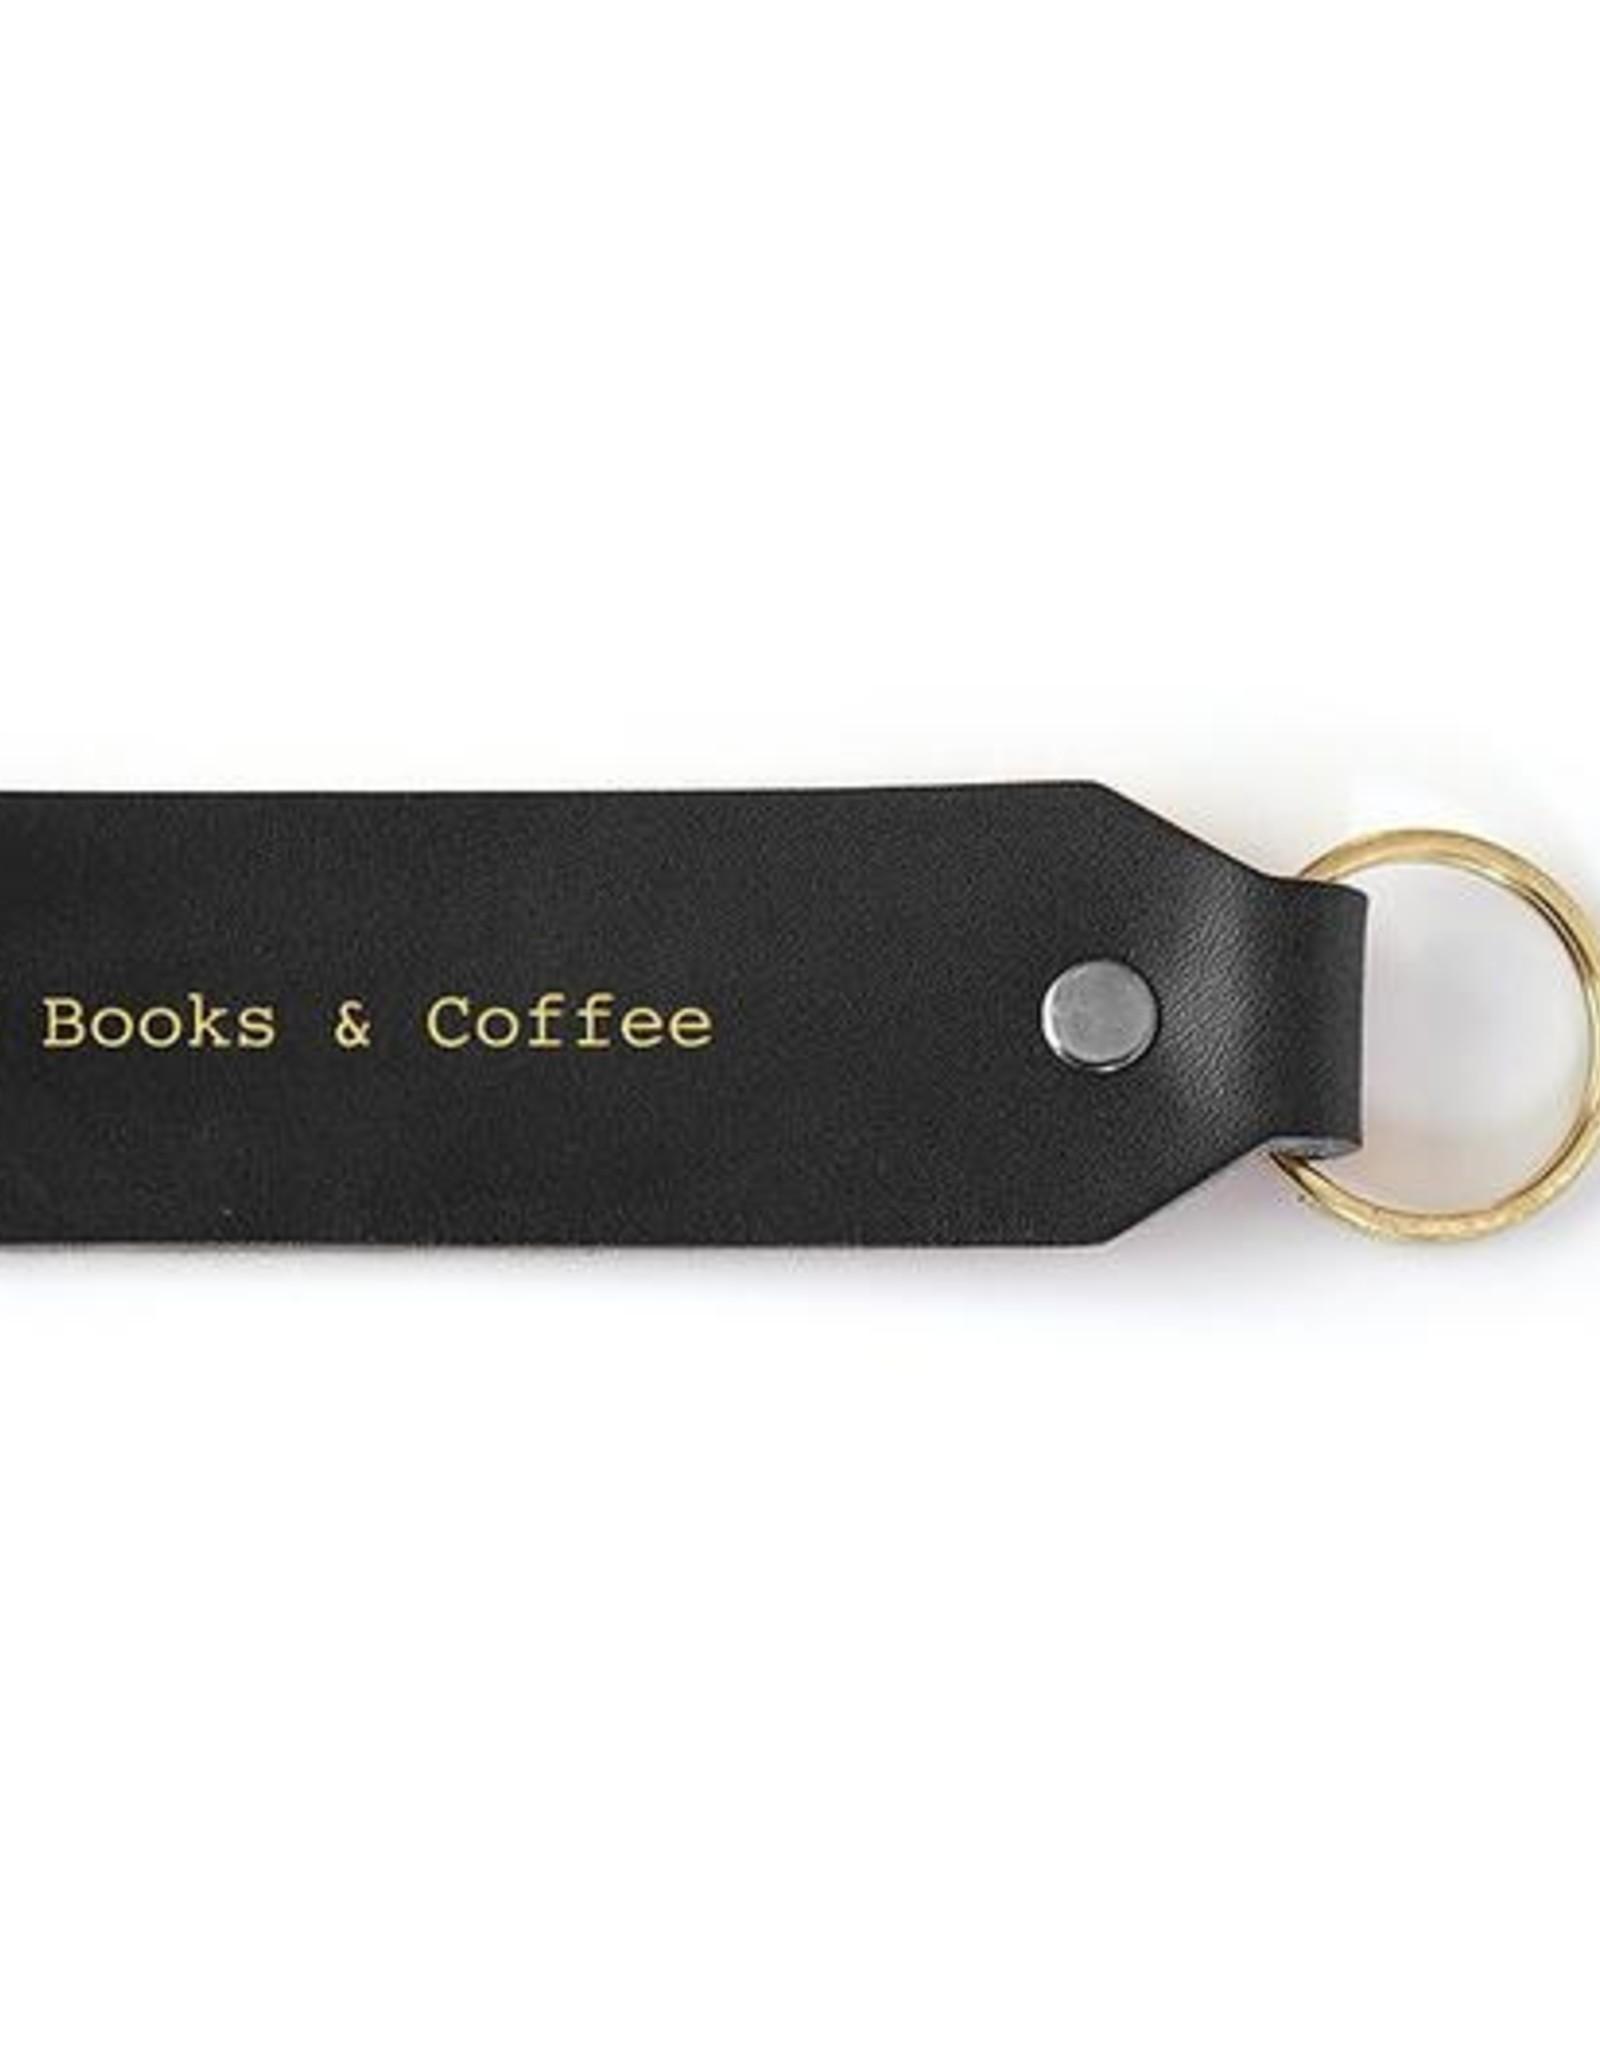 Seltzer Goods Leather Keychain: Books & Coffee